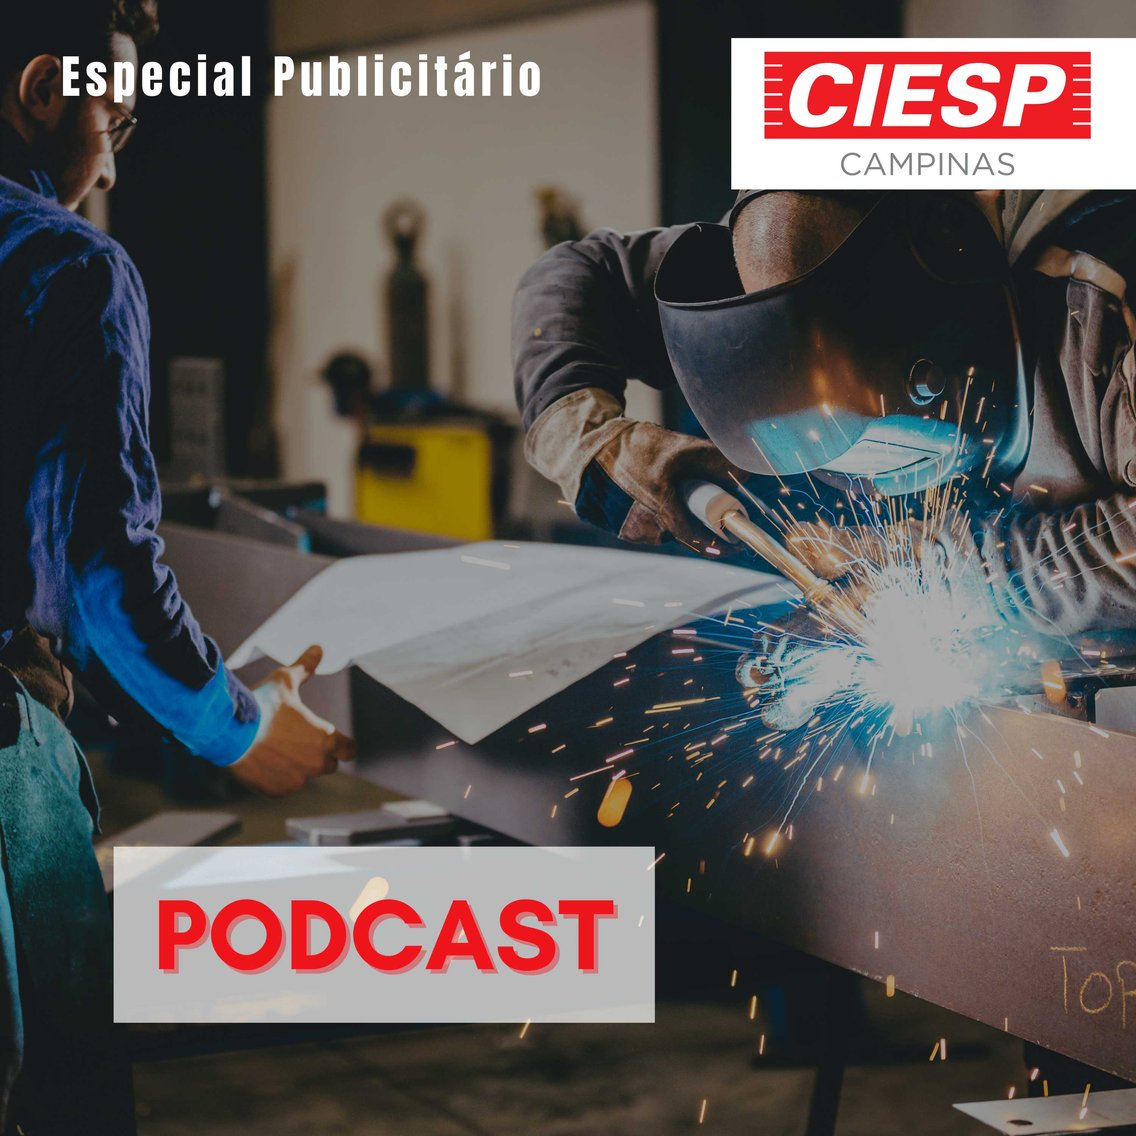 CIESP - Campinas - Cover Image